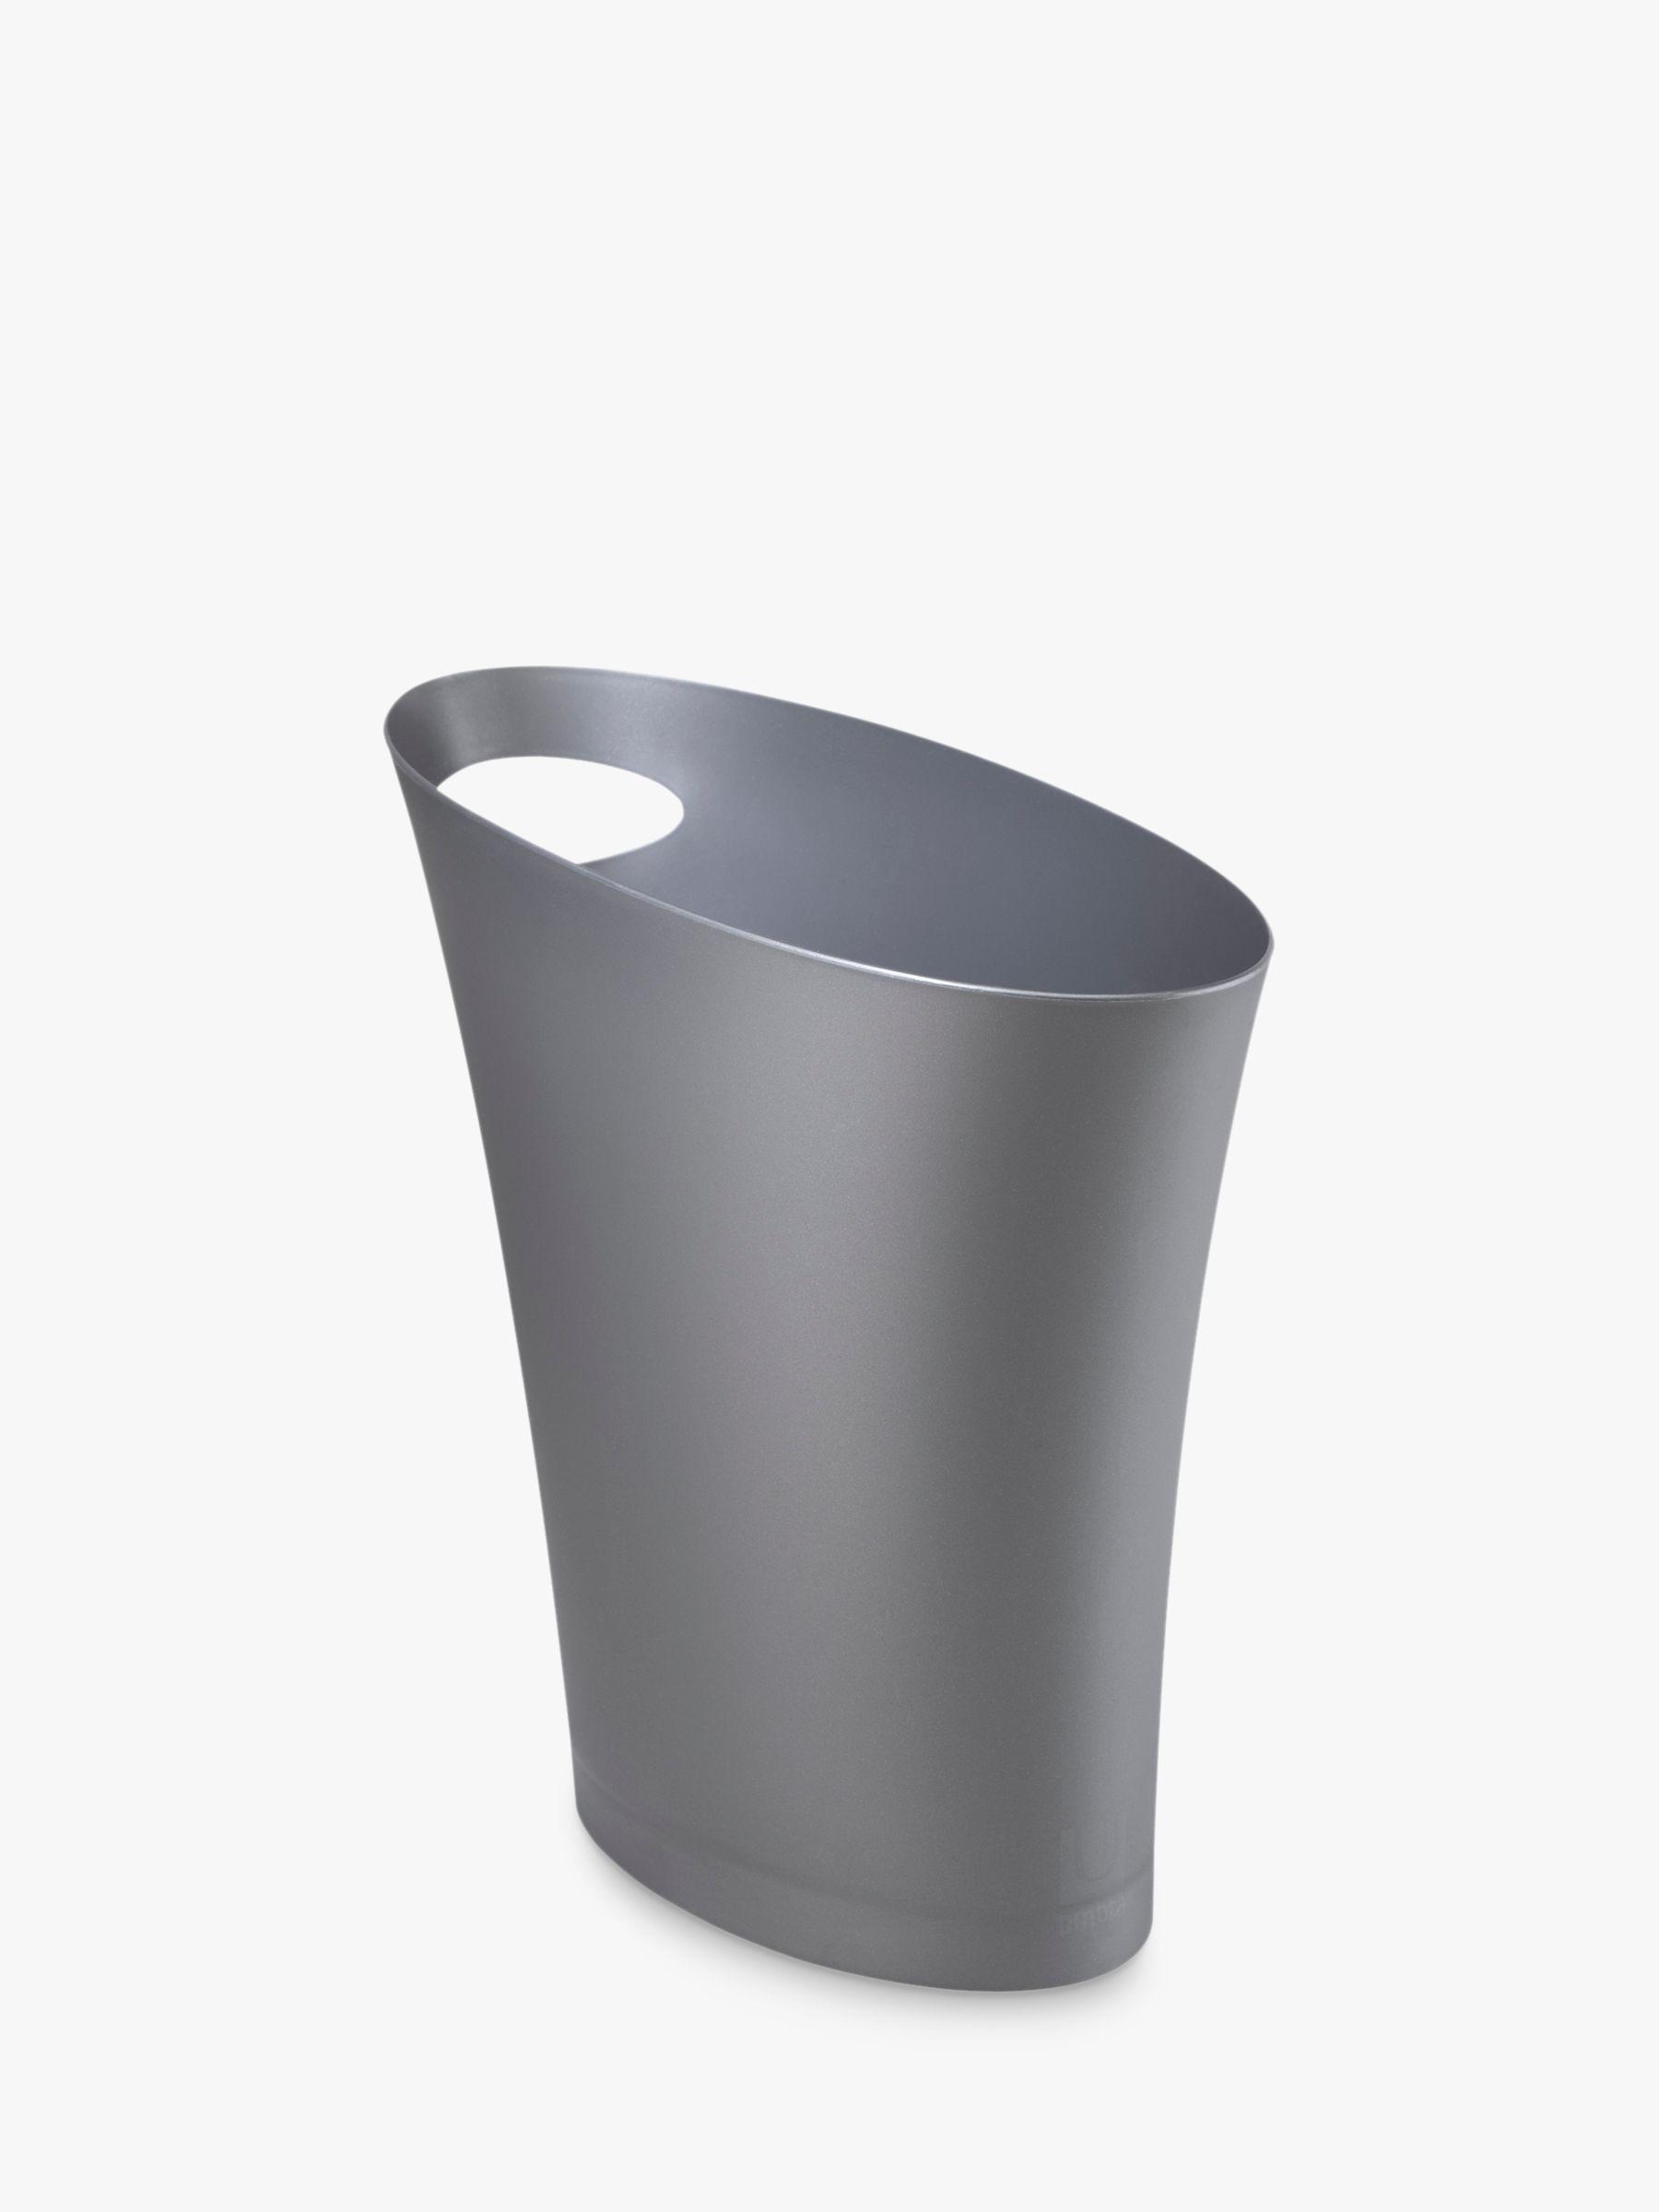 Umbra Umbra Skinny Can Waste Paper Bin